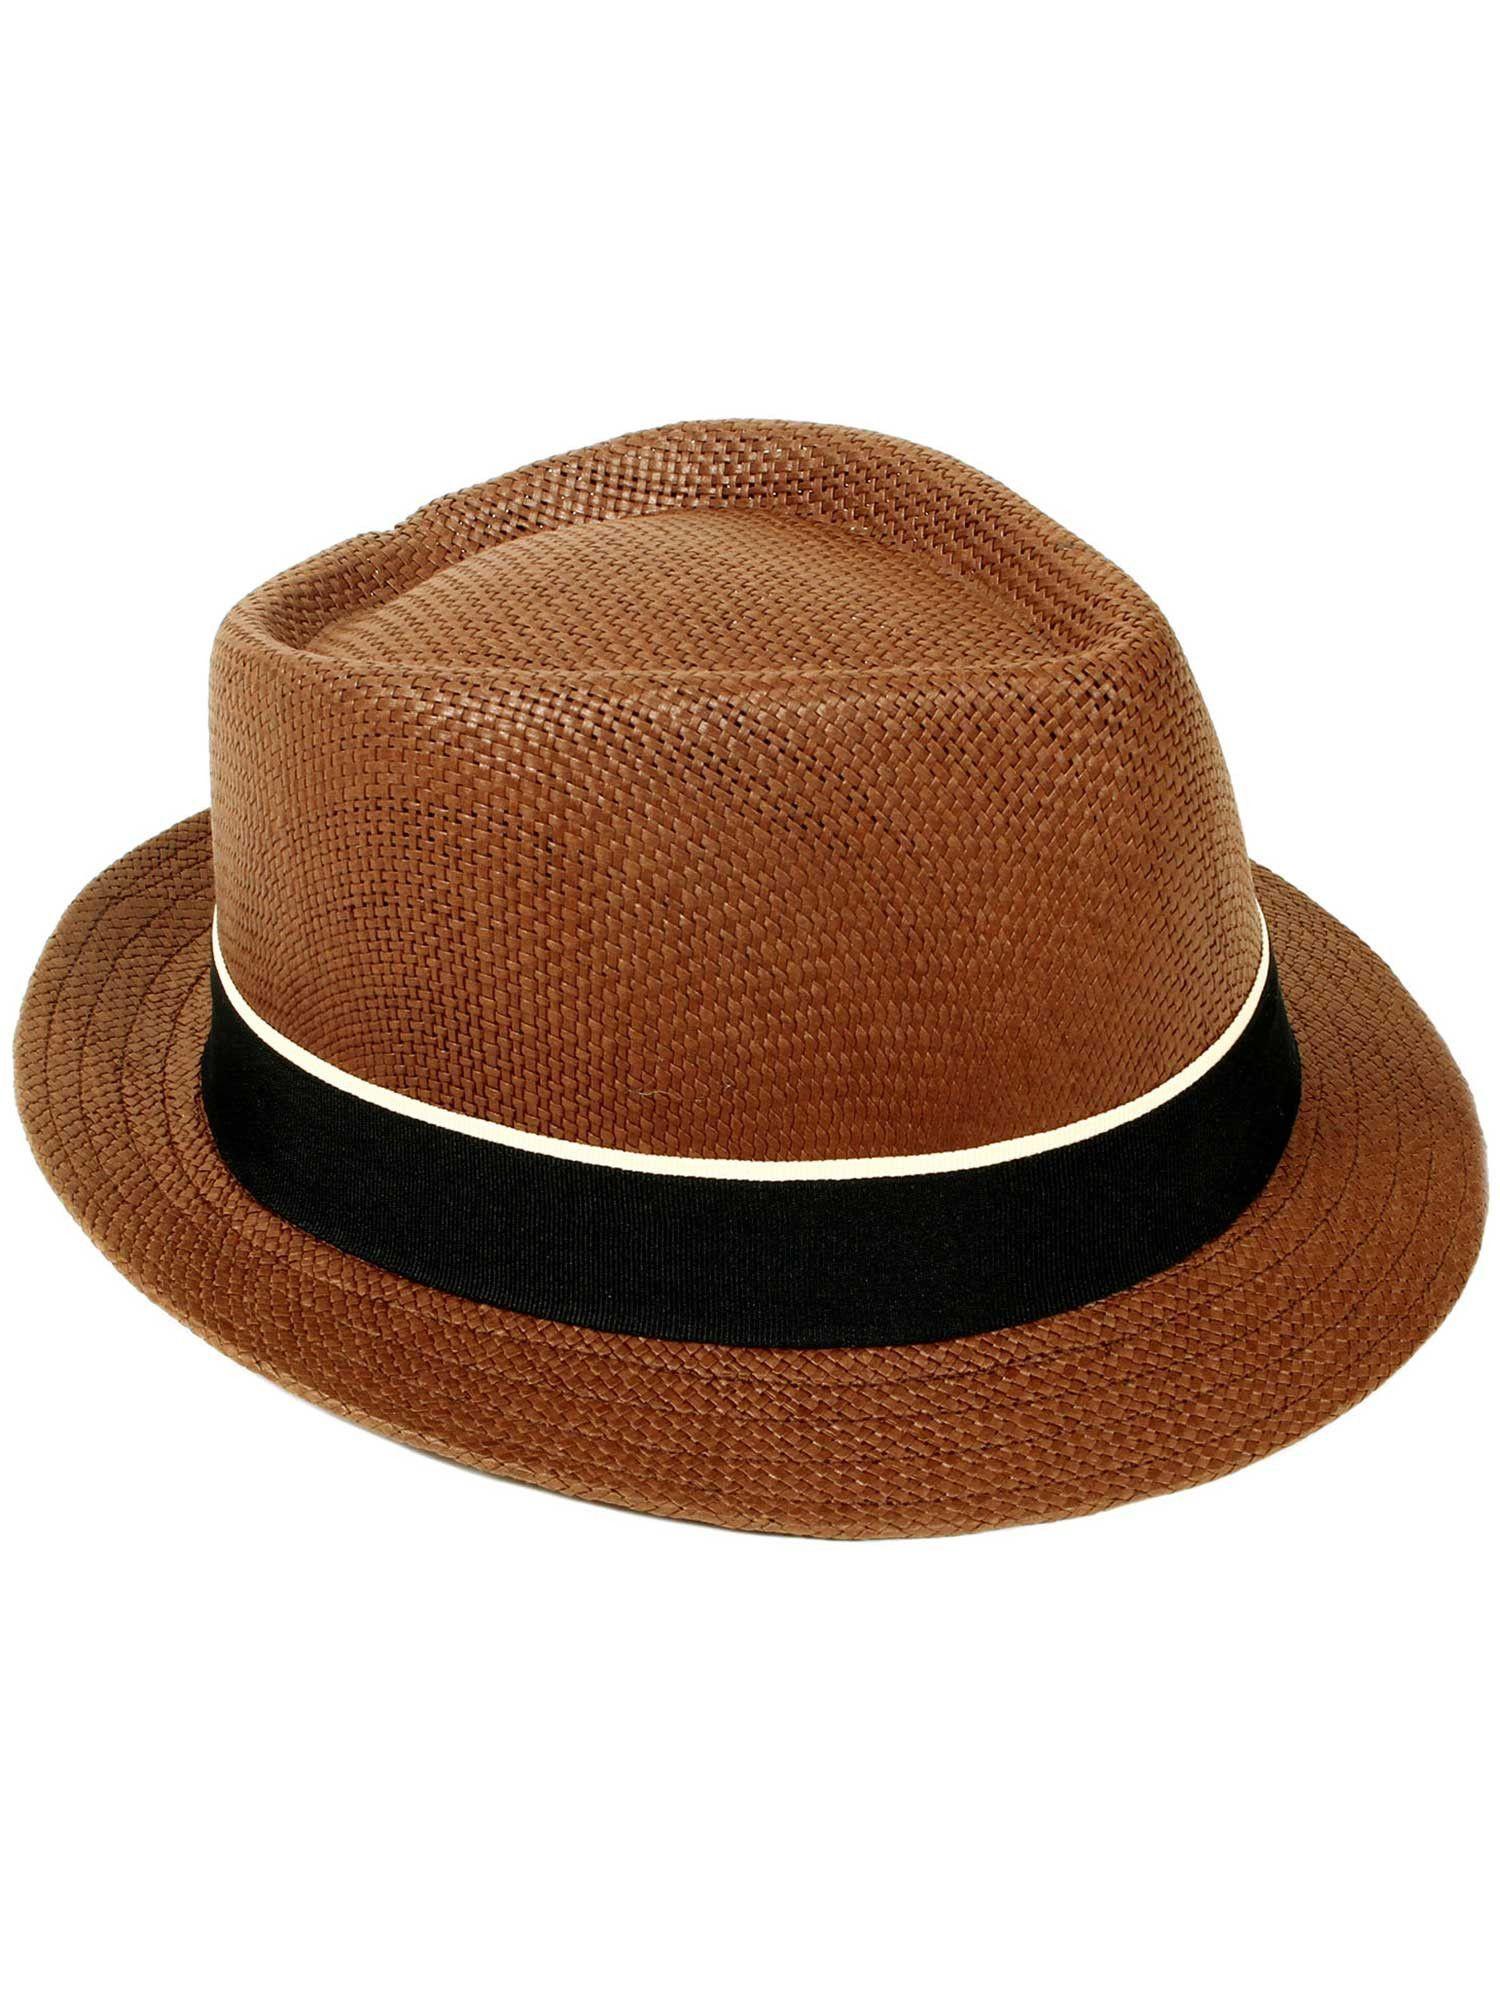 Straw Fedora Hat w  Belt  acfc7ab6df54